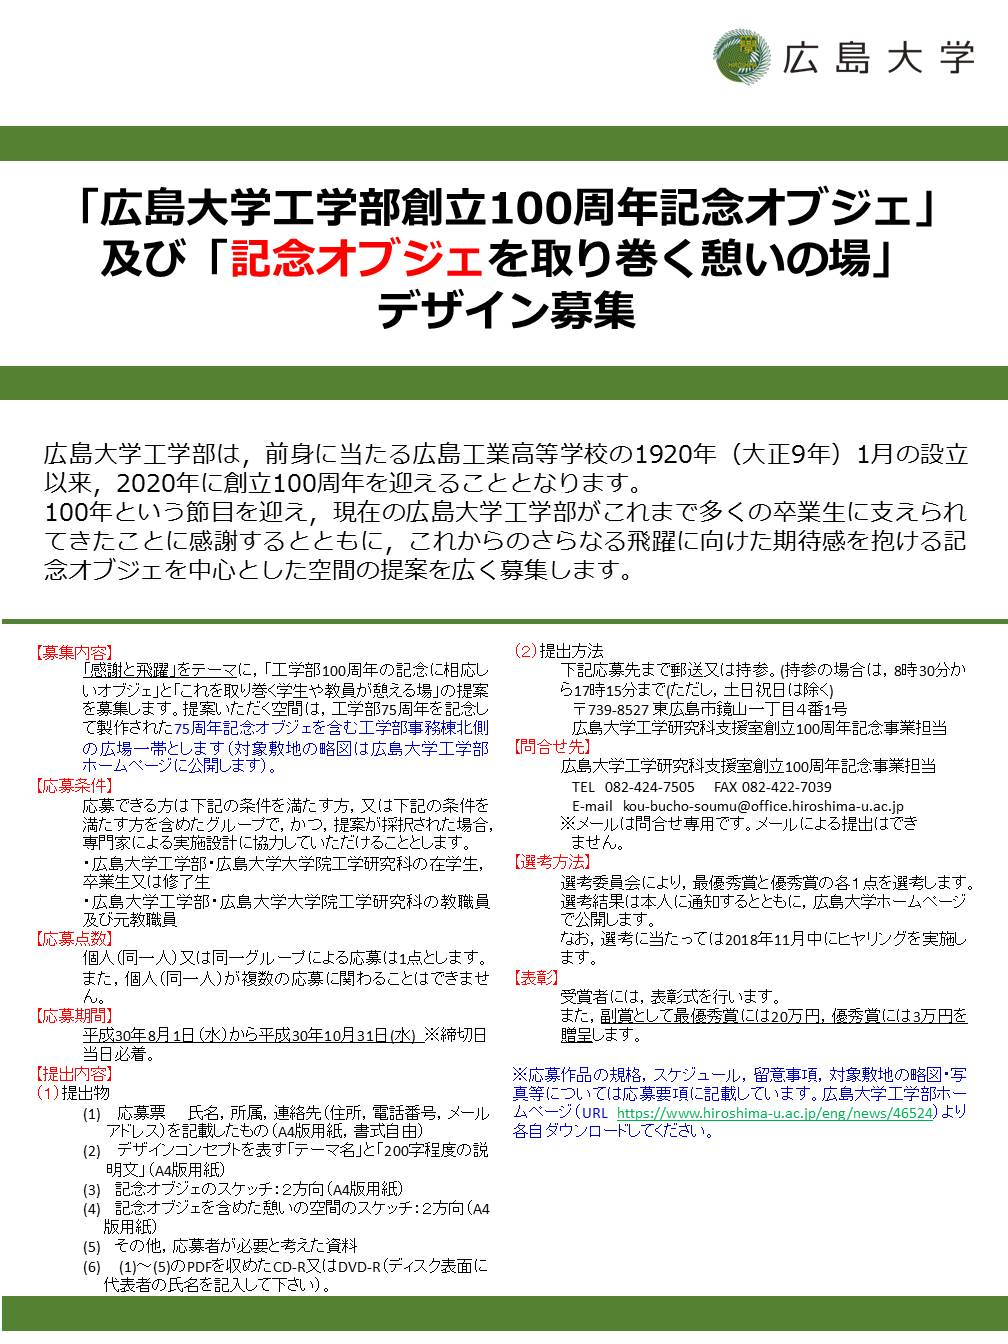 工学部創立100周年記念事業ポスター